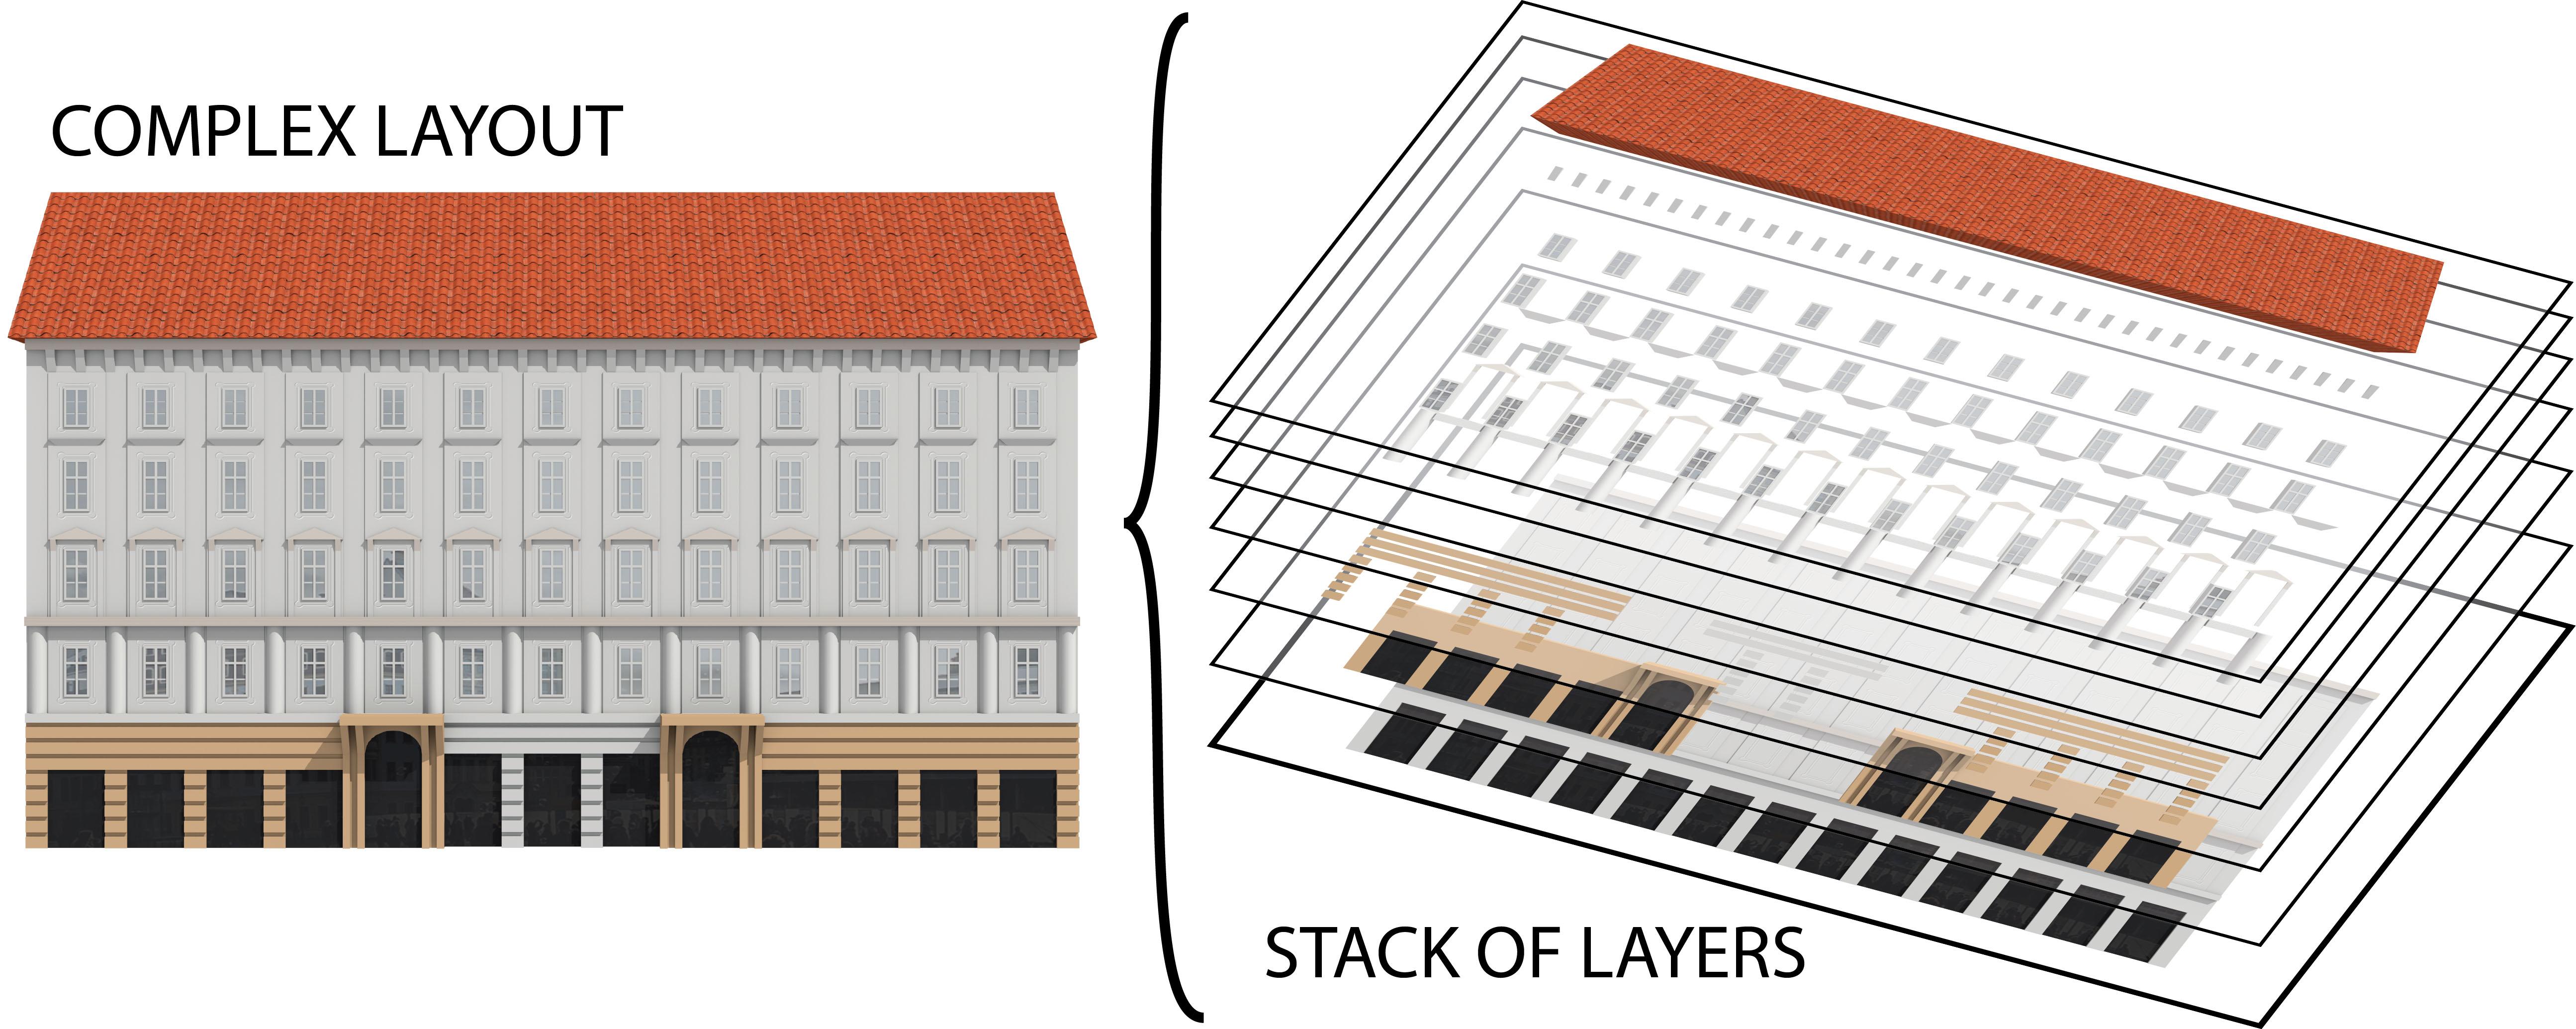 Layer-Based Procedural Design of Façades